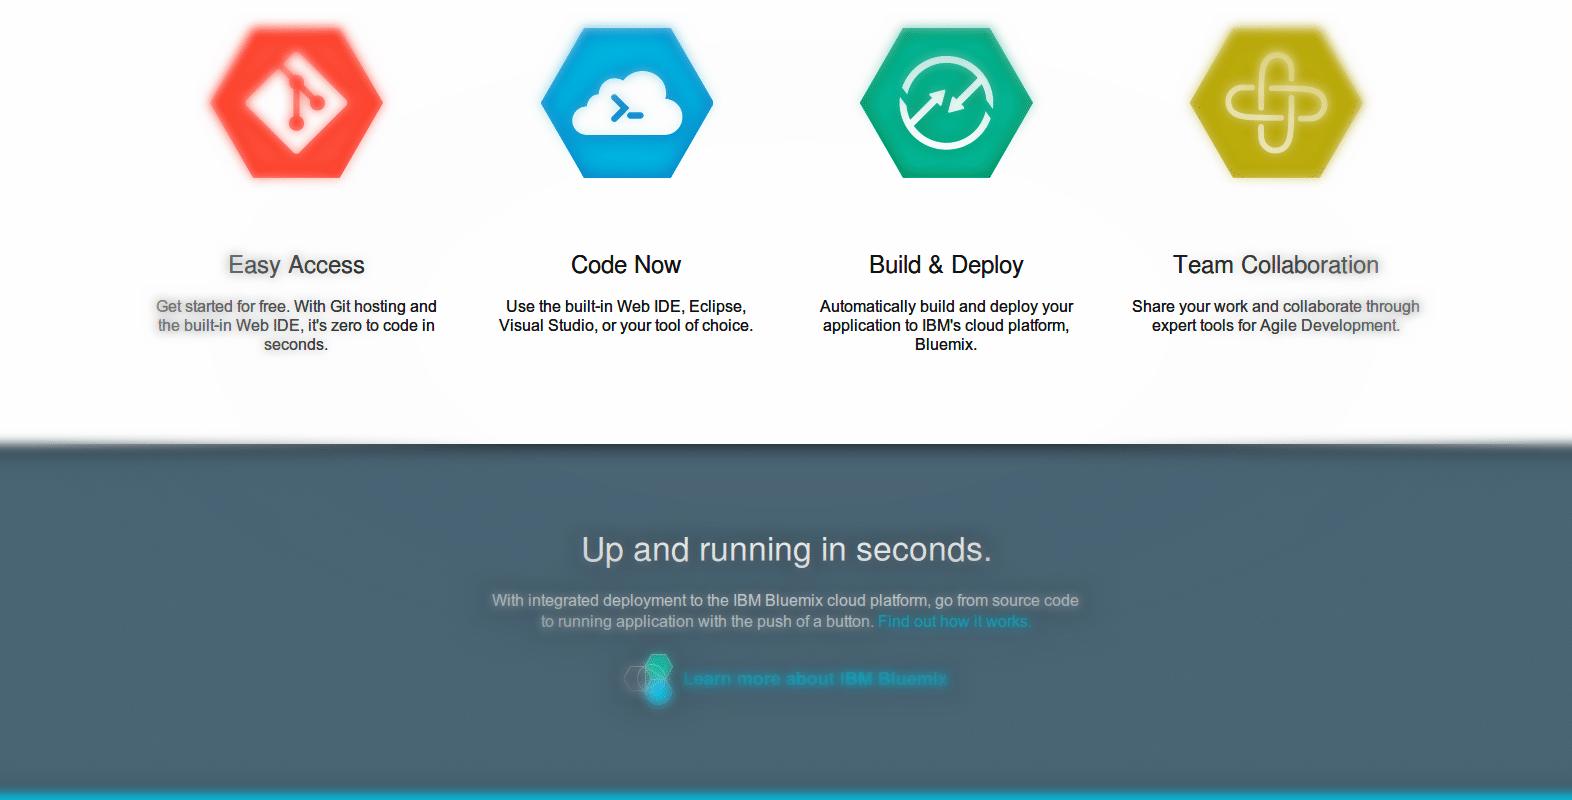 IBM Bluemix DevOps